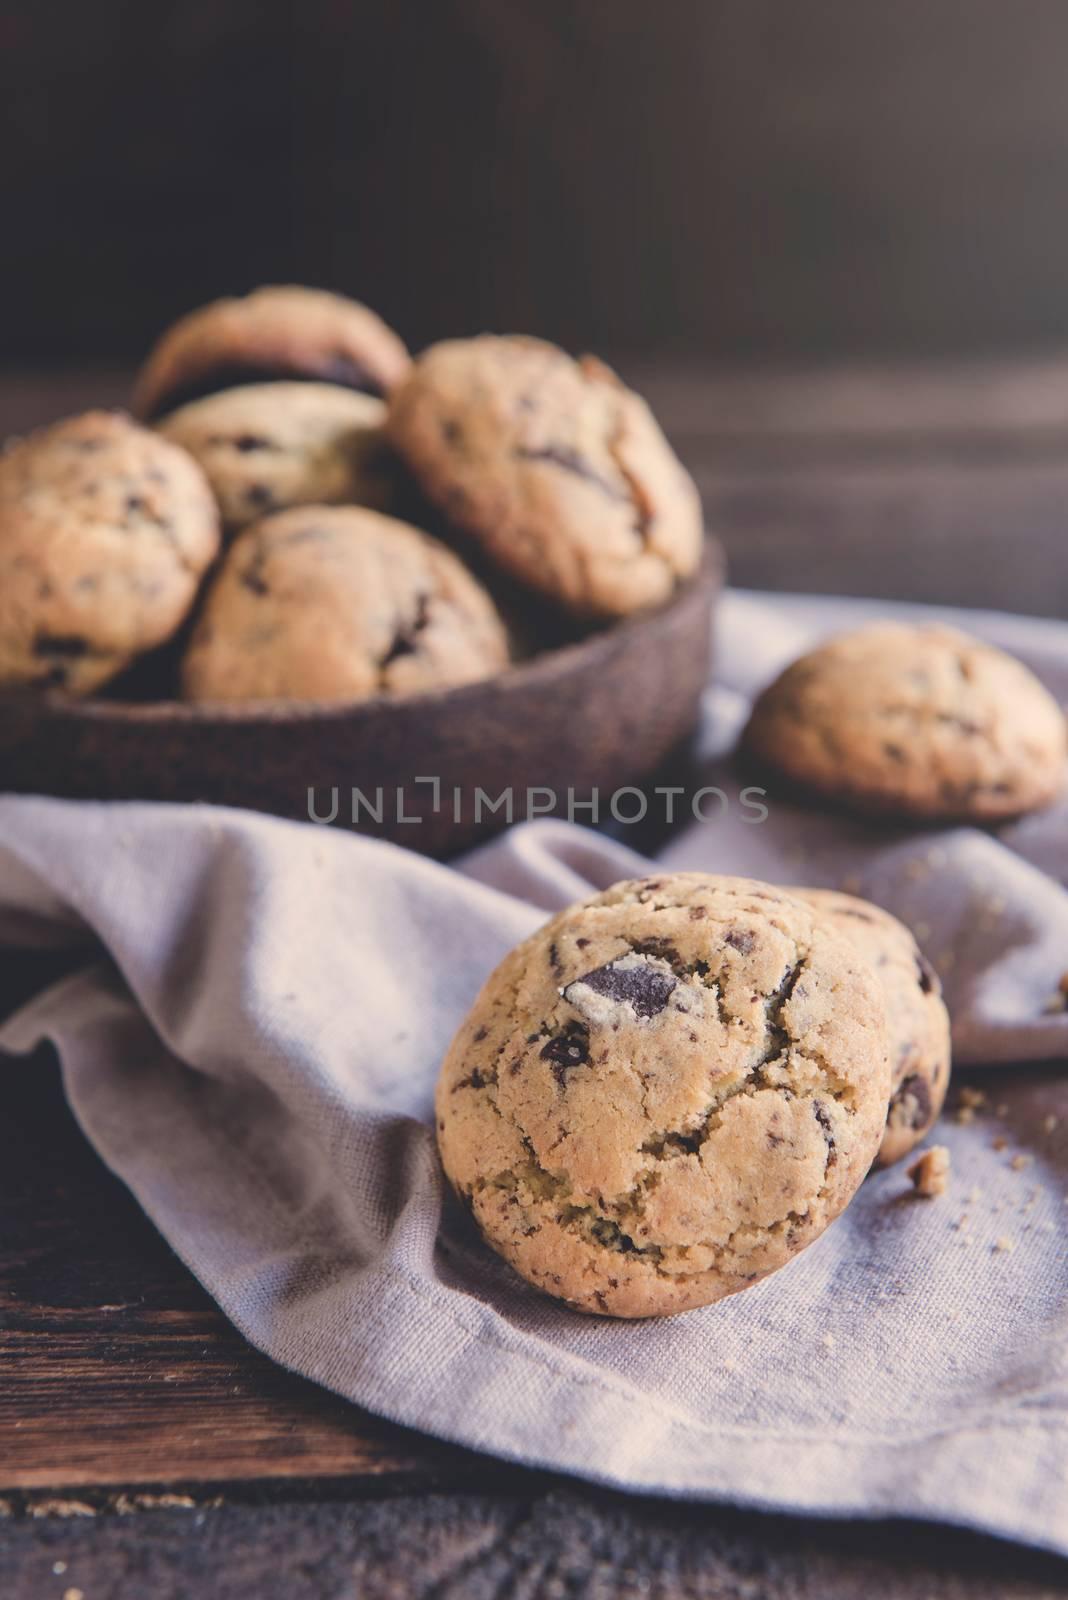 Mini chcocolate chip cookies,selective focus